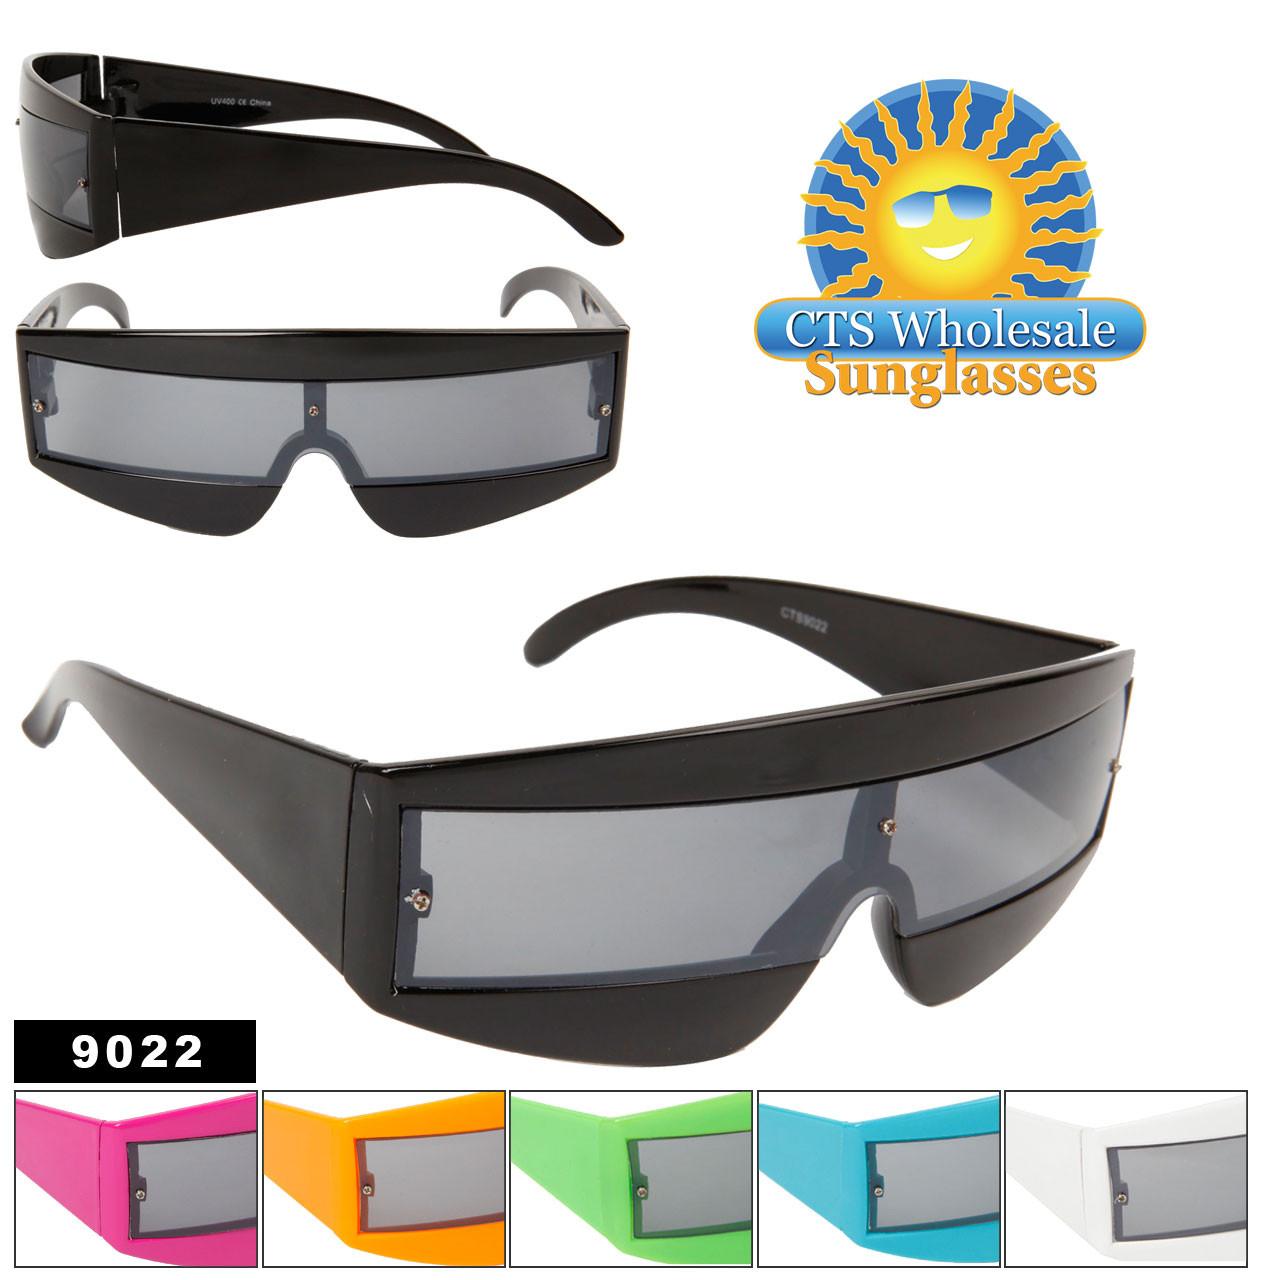 Lady Gaga Inspired Sunglasses #9022